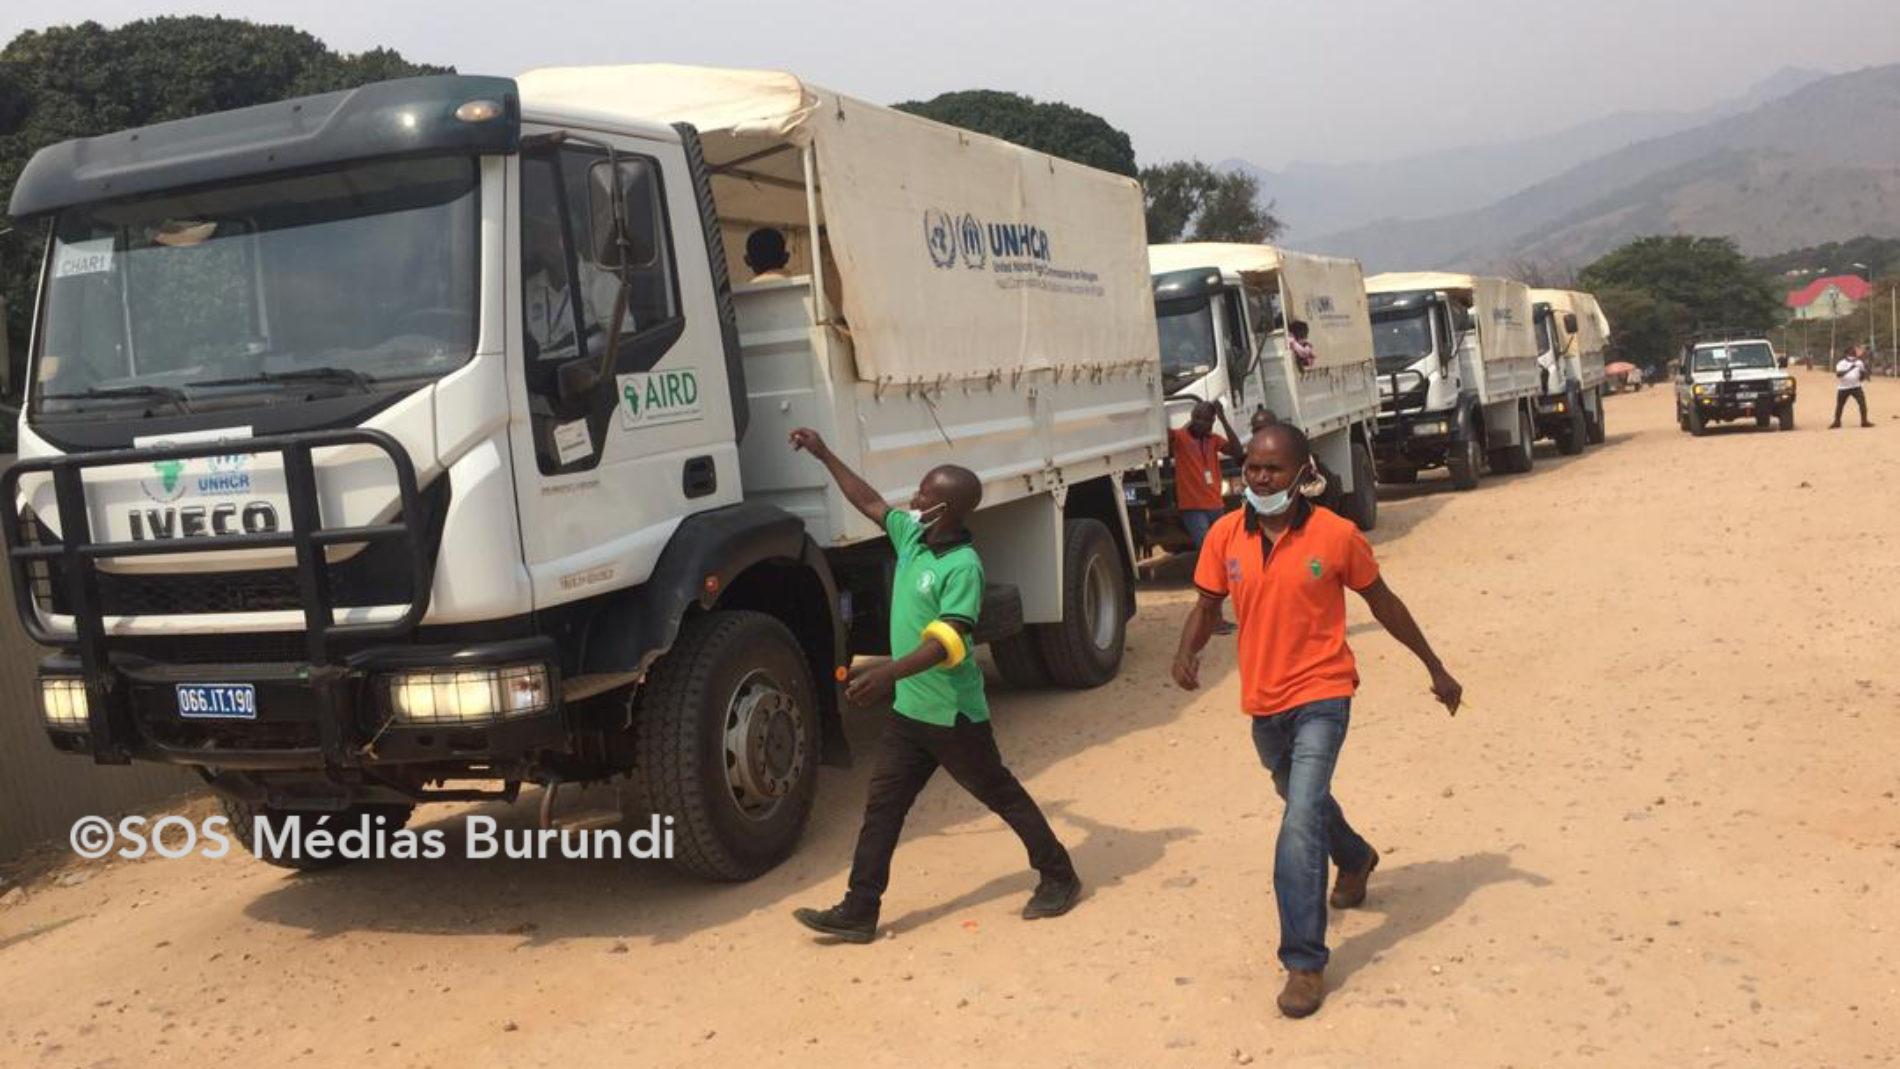 Kavimvira : des demandeurs d'asile burundais rapatriés